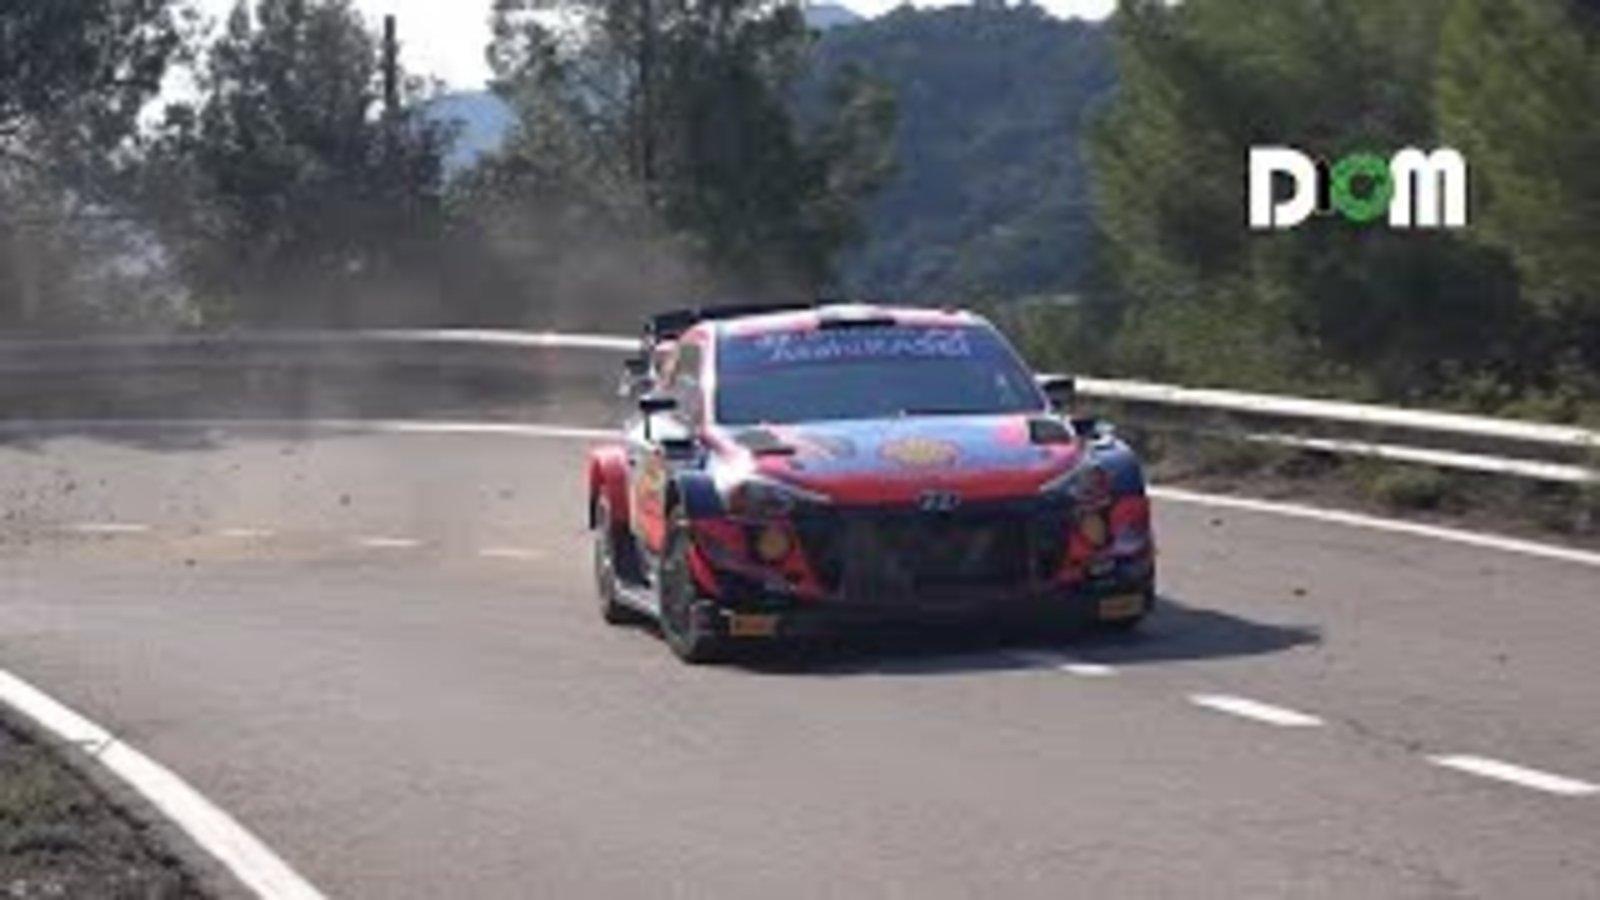 Rallye-Spanien-Shakedown